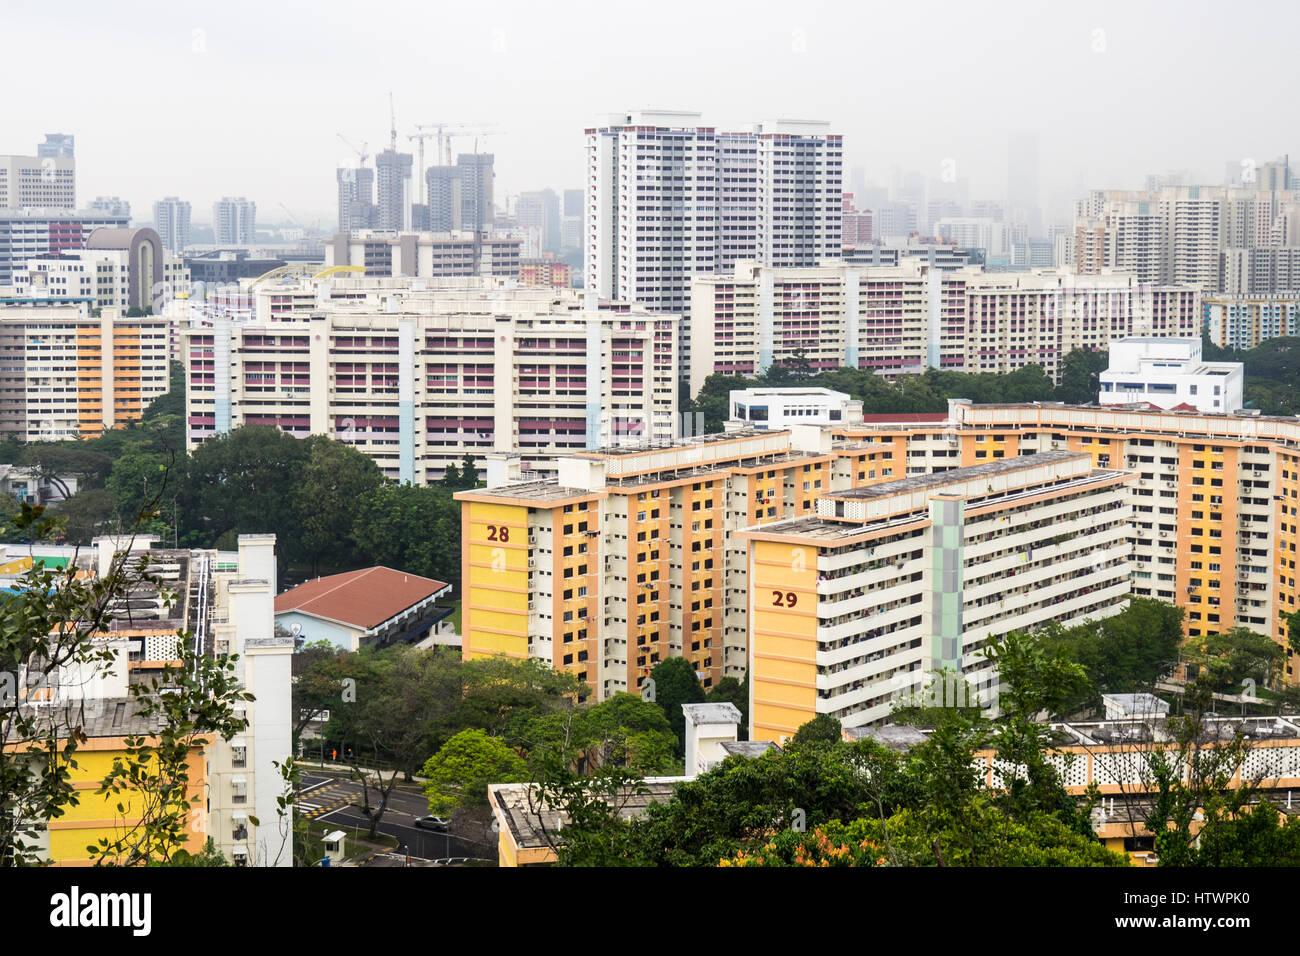 High density urban residential towers in Bukit Merah, Singapore. Stock Photo